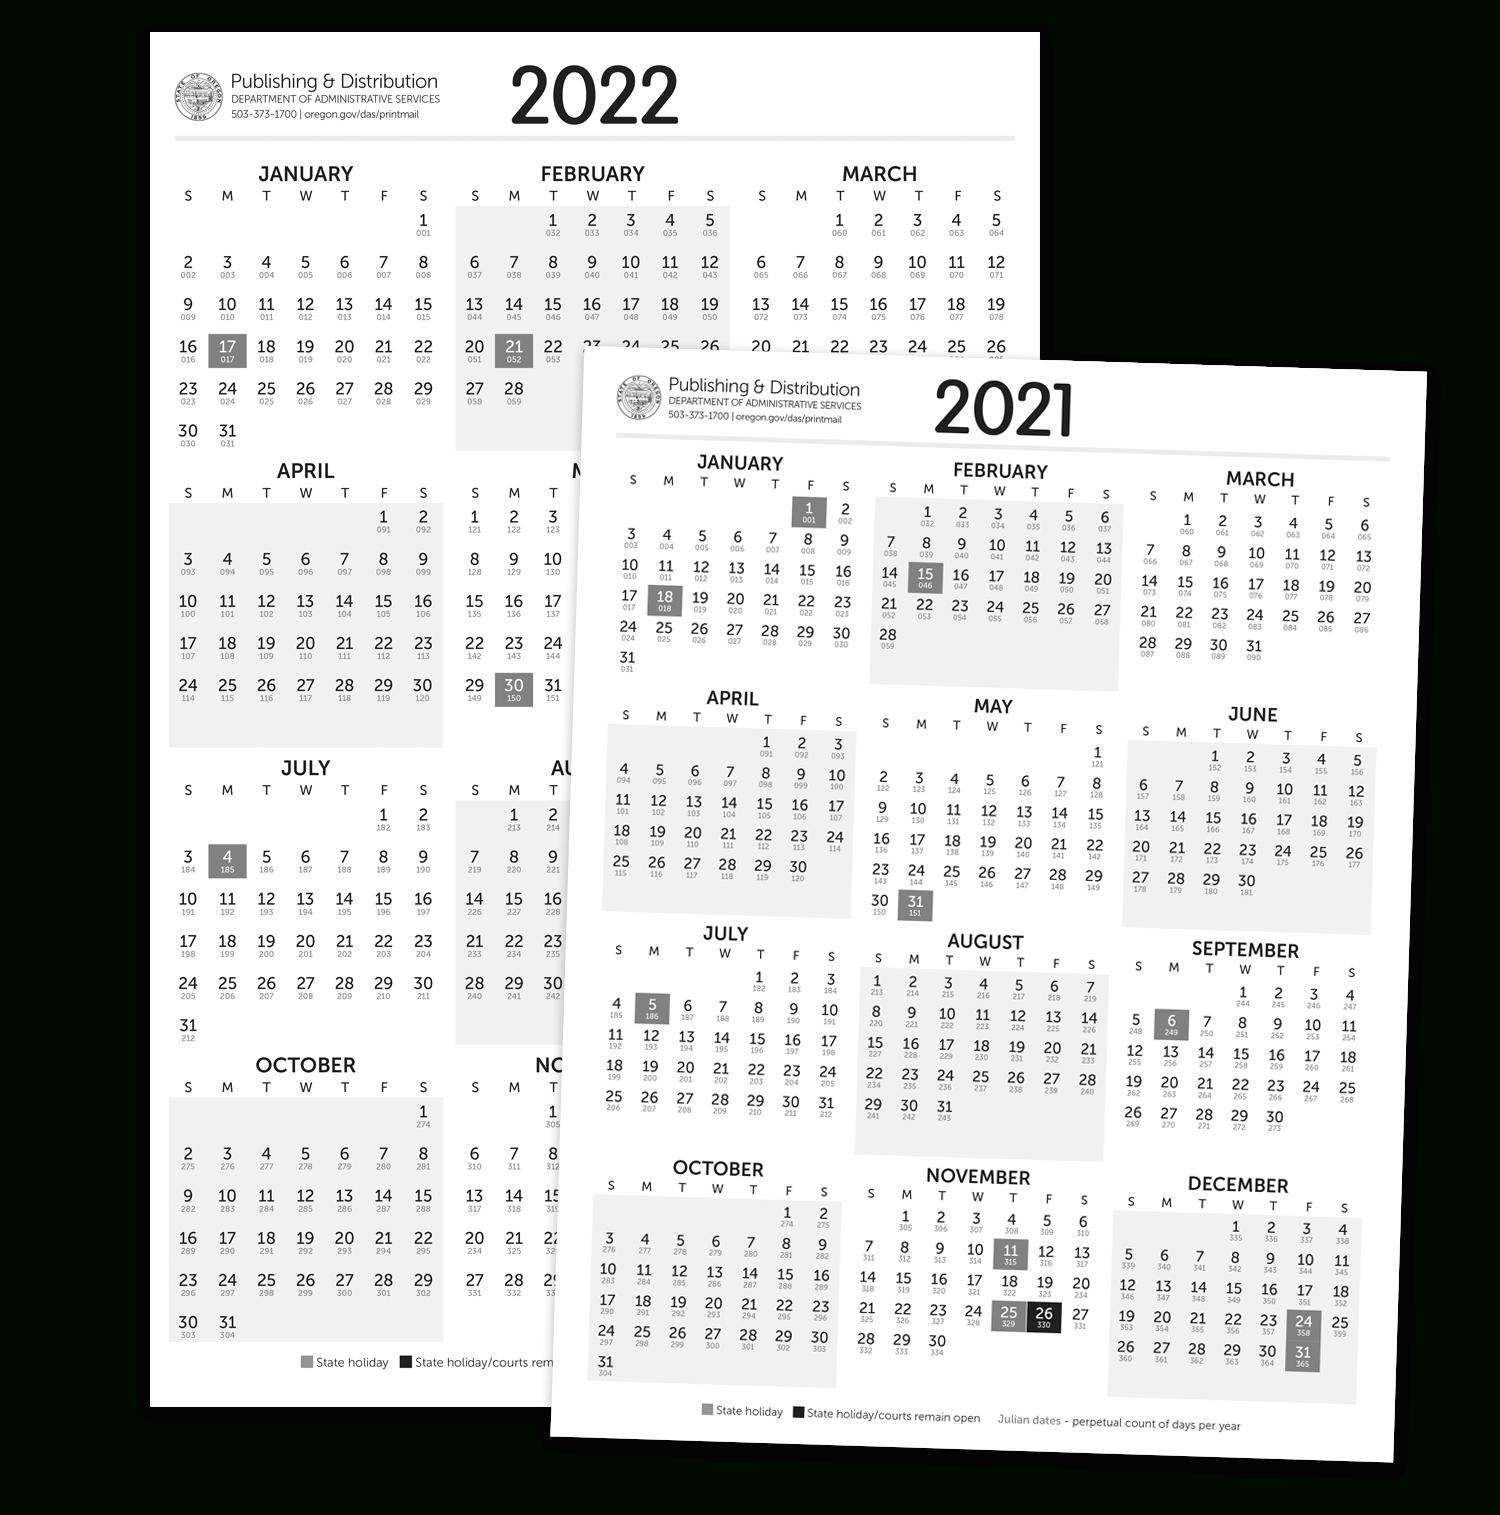 Julian Calendar For Leap Year 2021 | Printable Calendar  Julian Date Calendar 2021 Printable